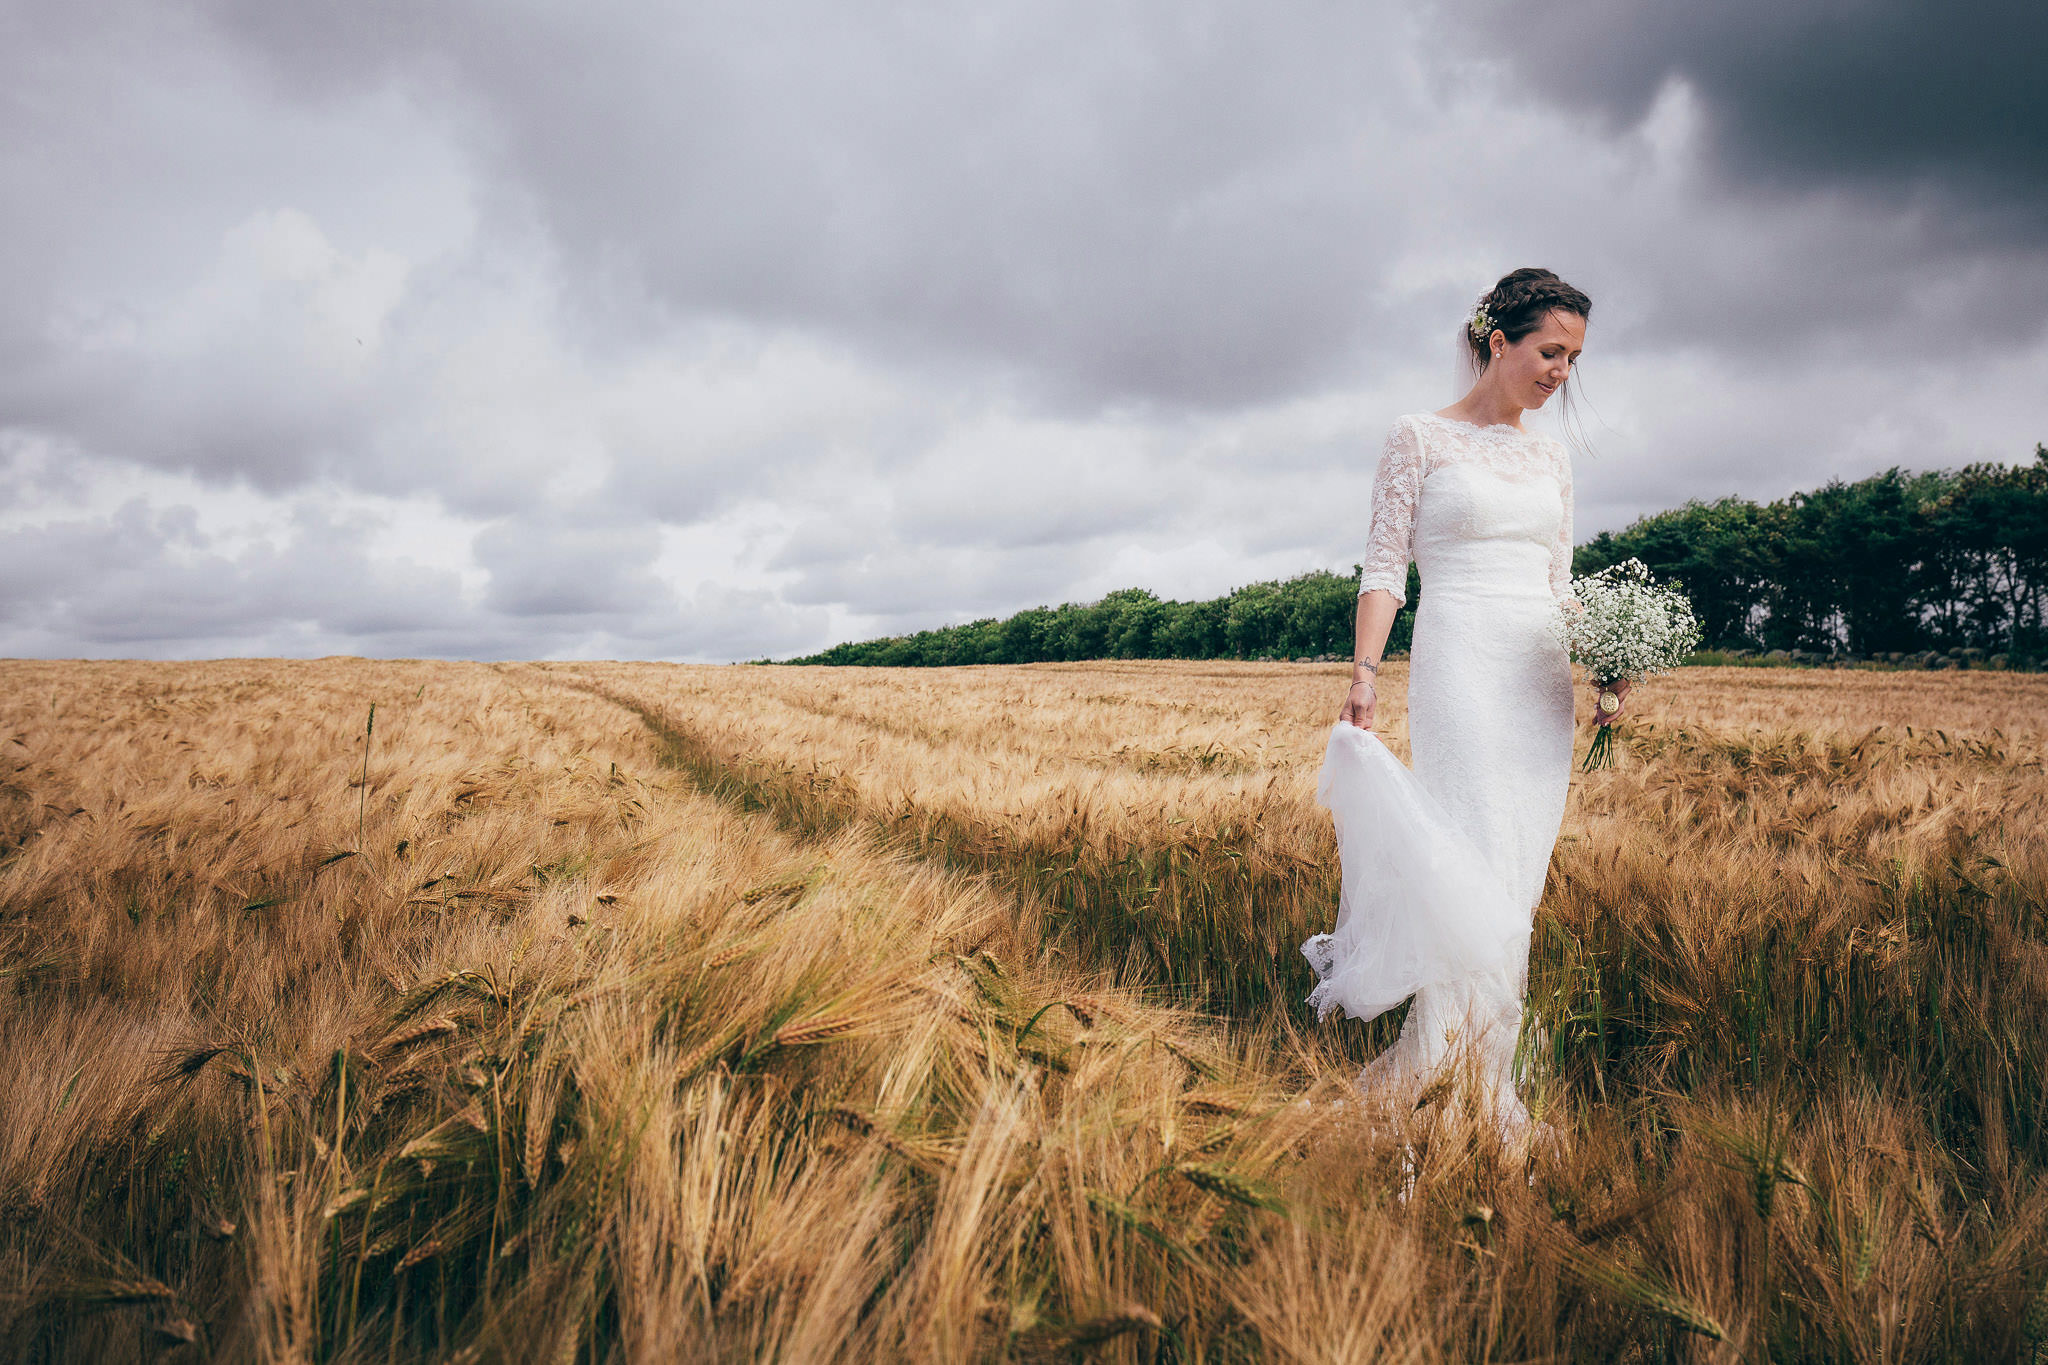 Norway+wedding+photographer+elopement+pre+wedding+Rogaland+bryllupsfotograf+Casey+Arneson-142.jpg